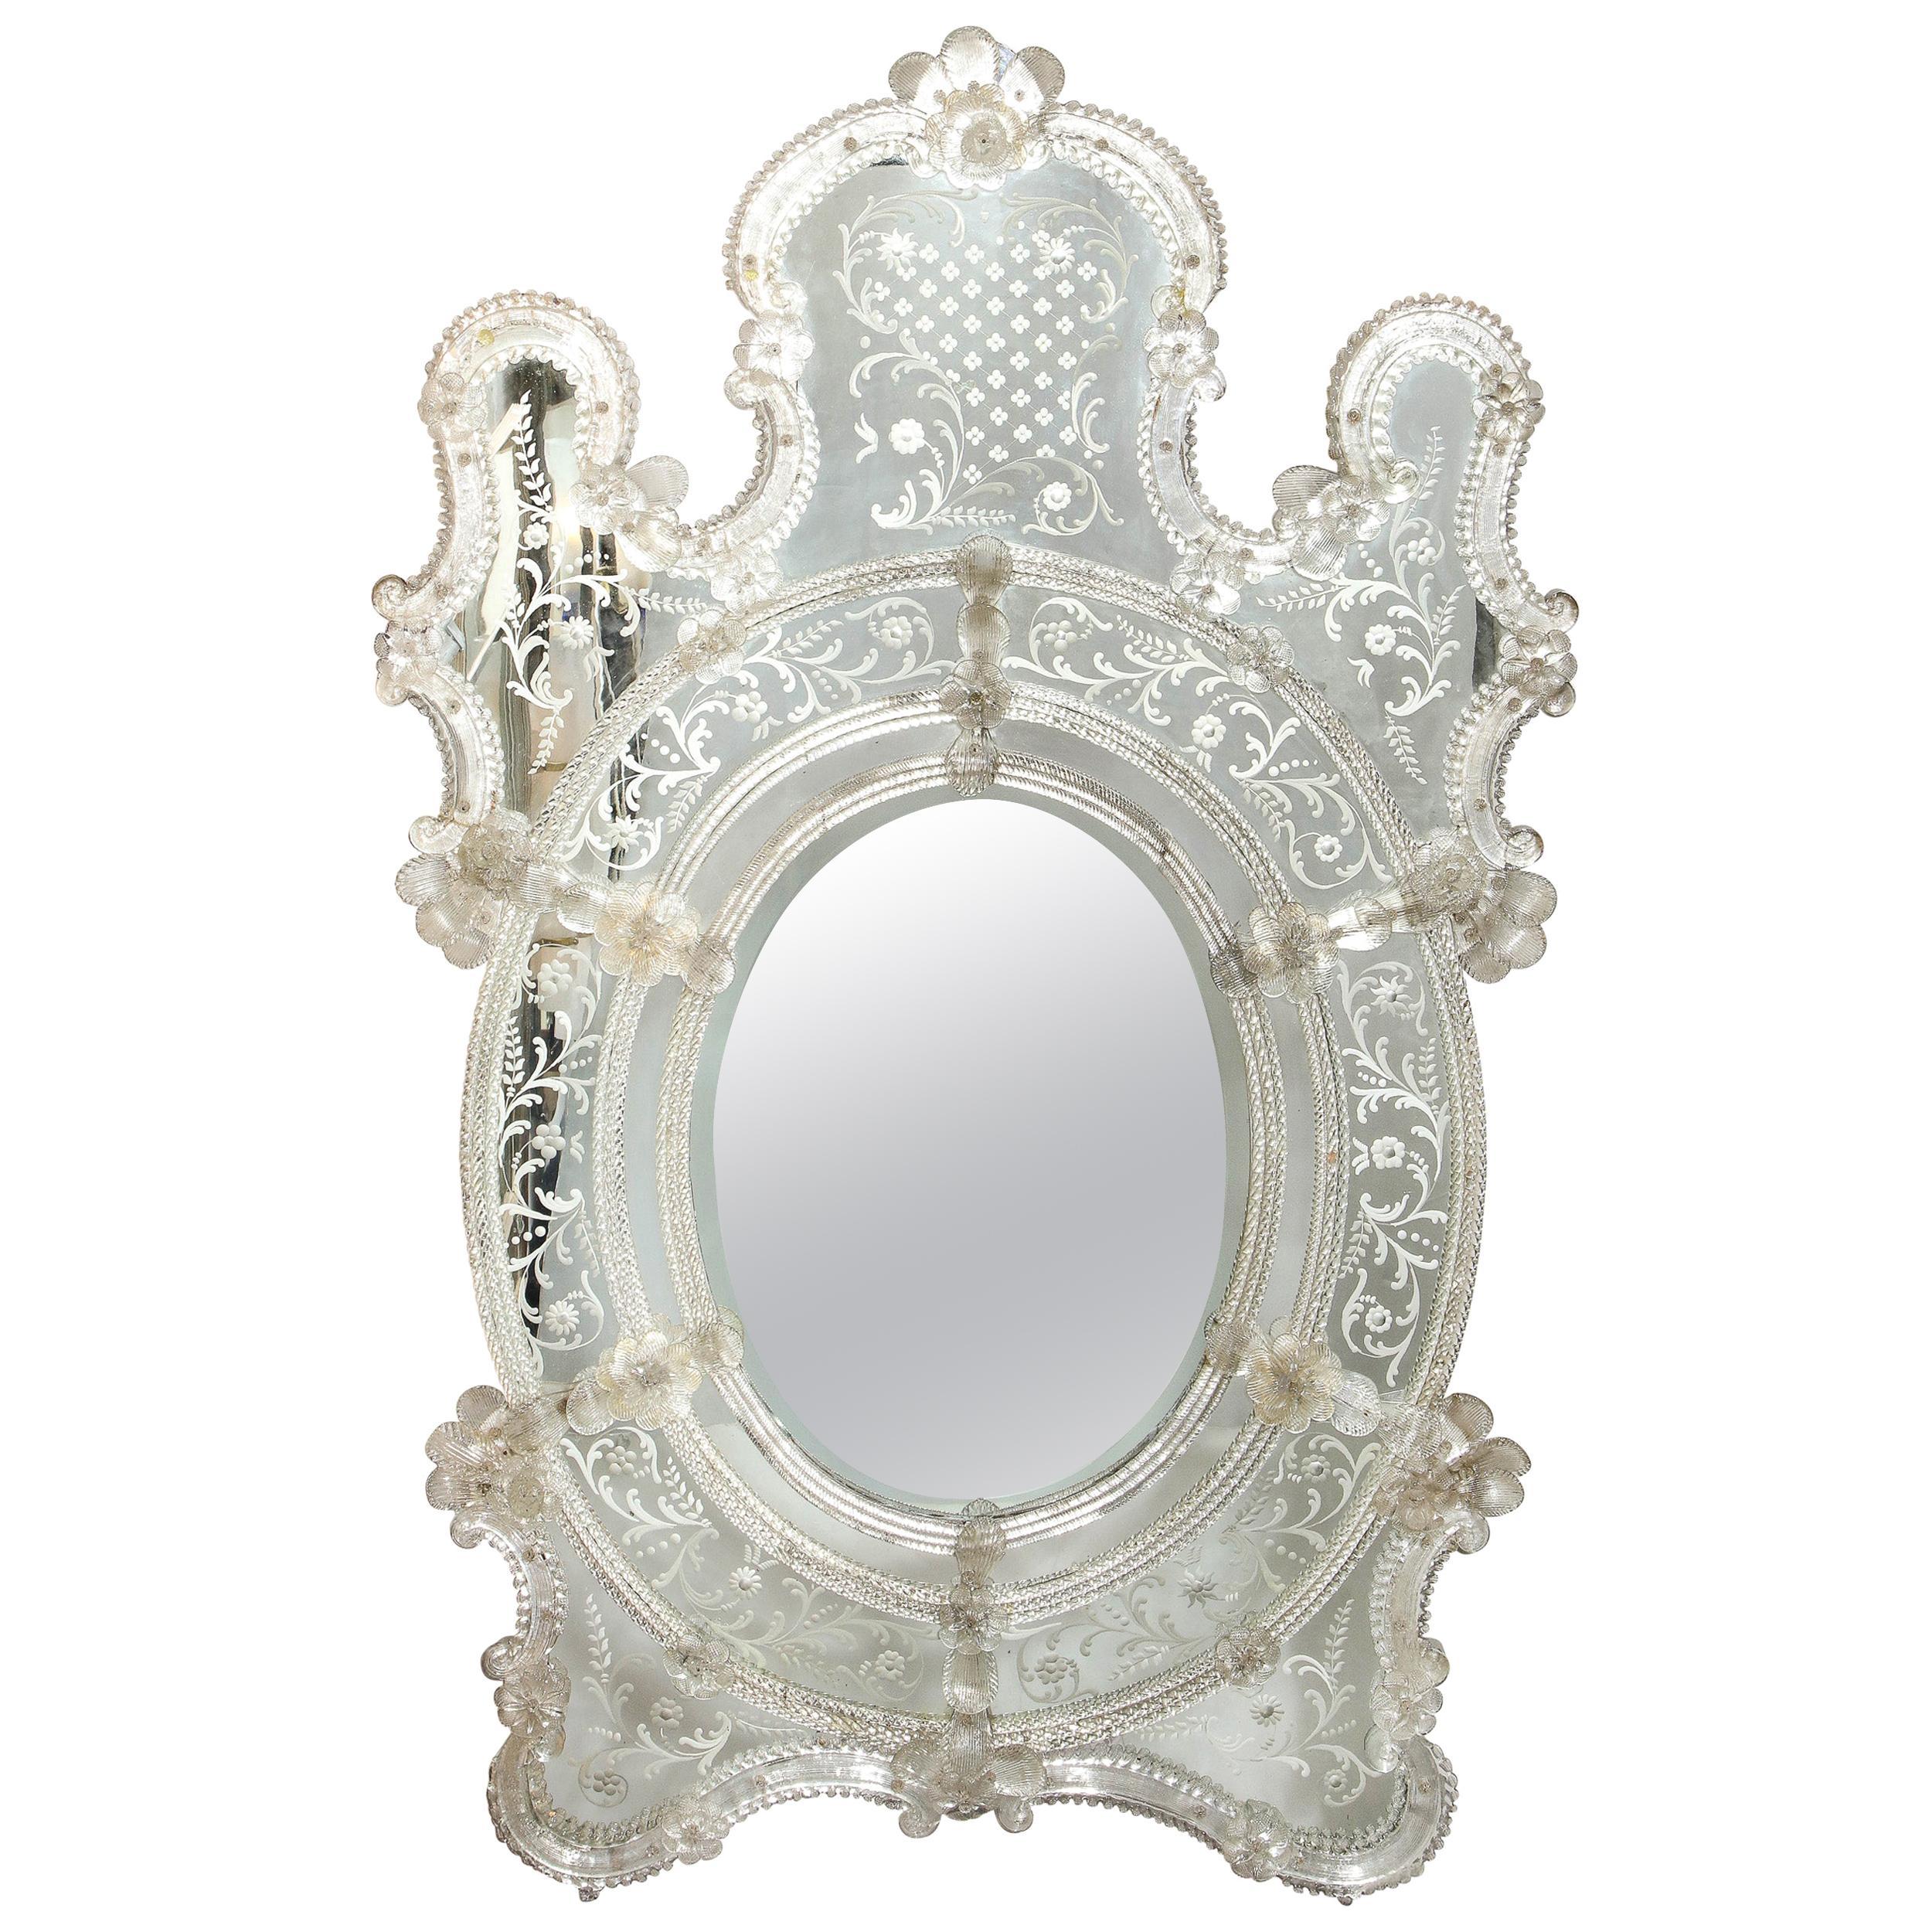 Mid Century Venetian Reverse Eglomise Braided Cartouche Mirror w/ Murano Florets